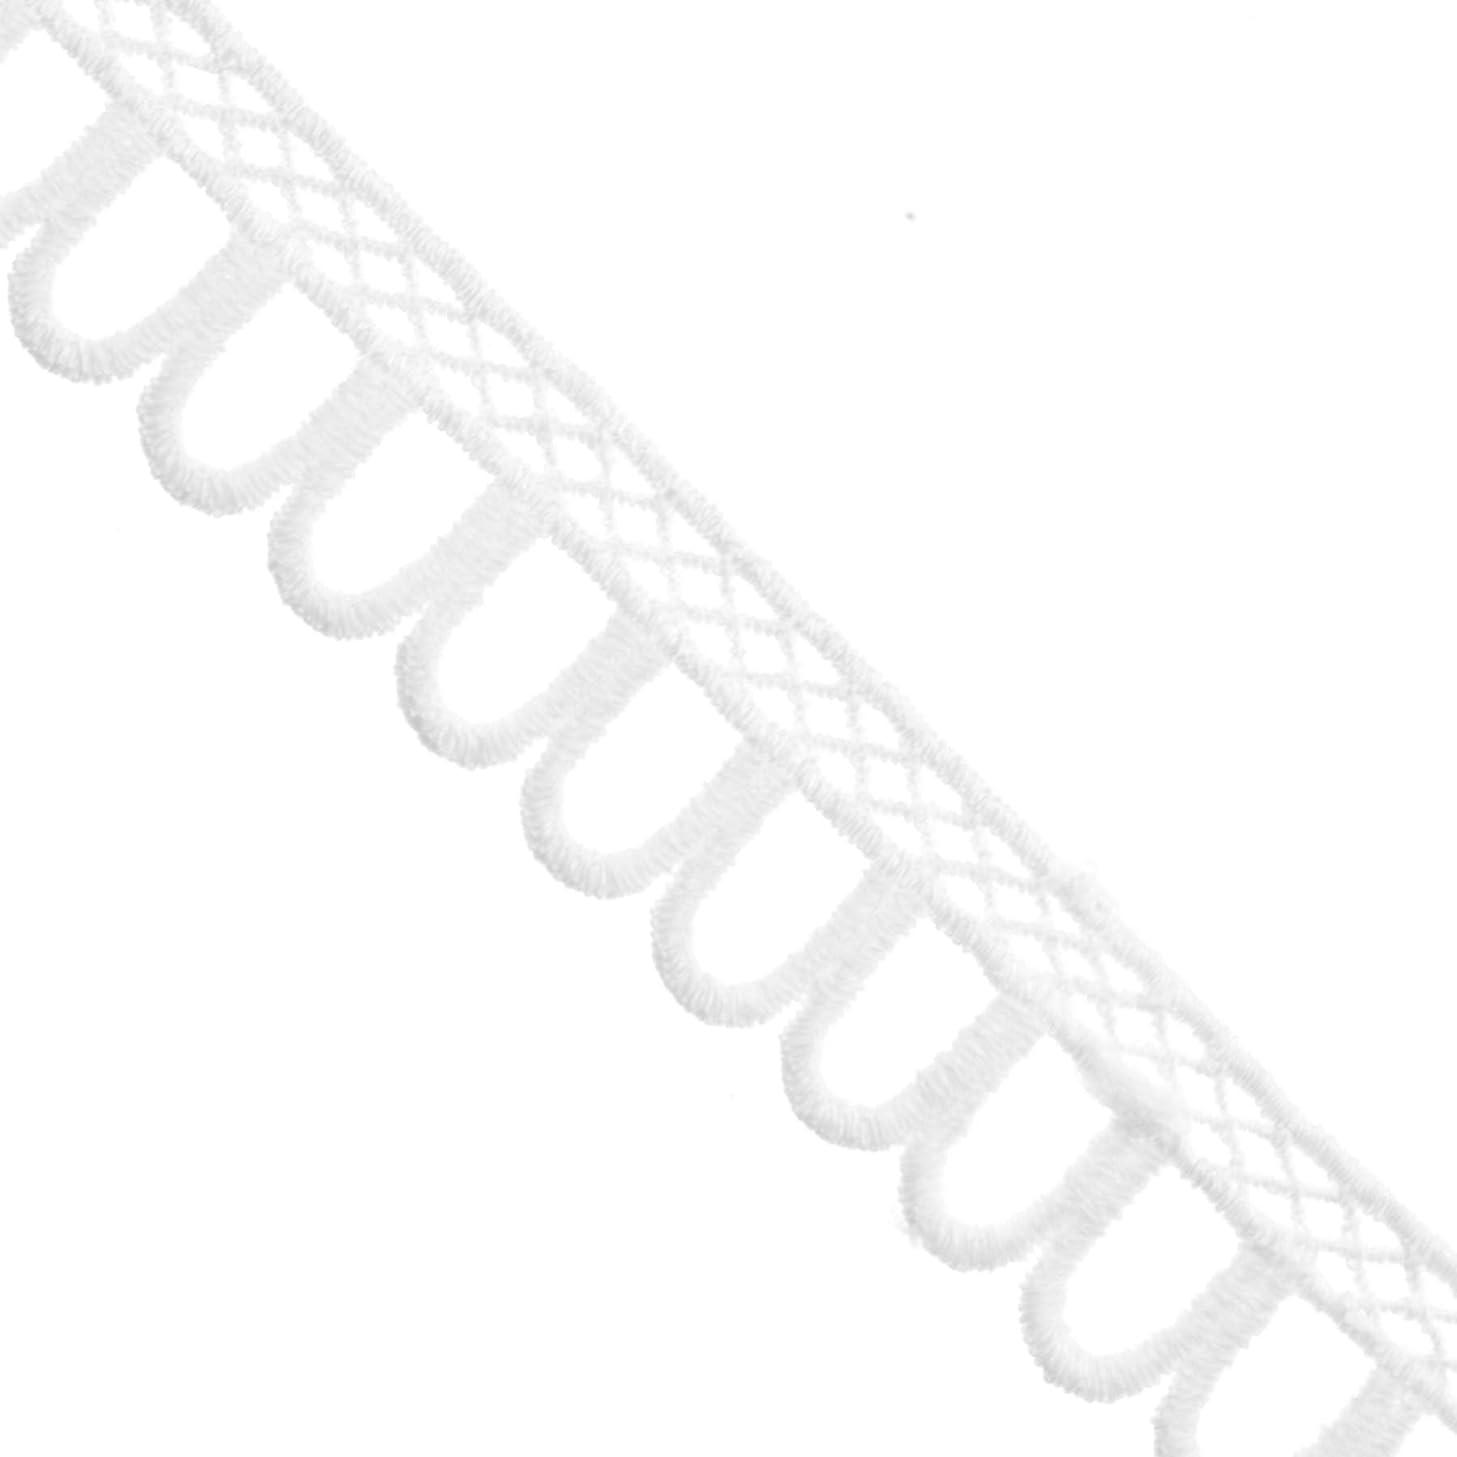 Polyester Crochet Edging Trim - No Stretch - 7/8